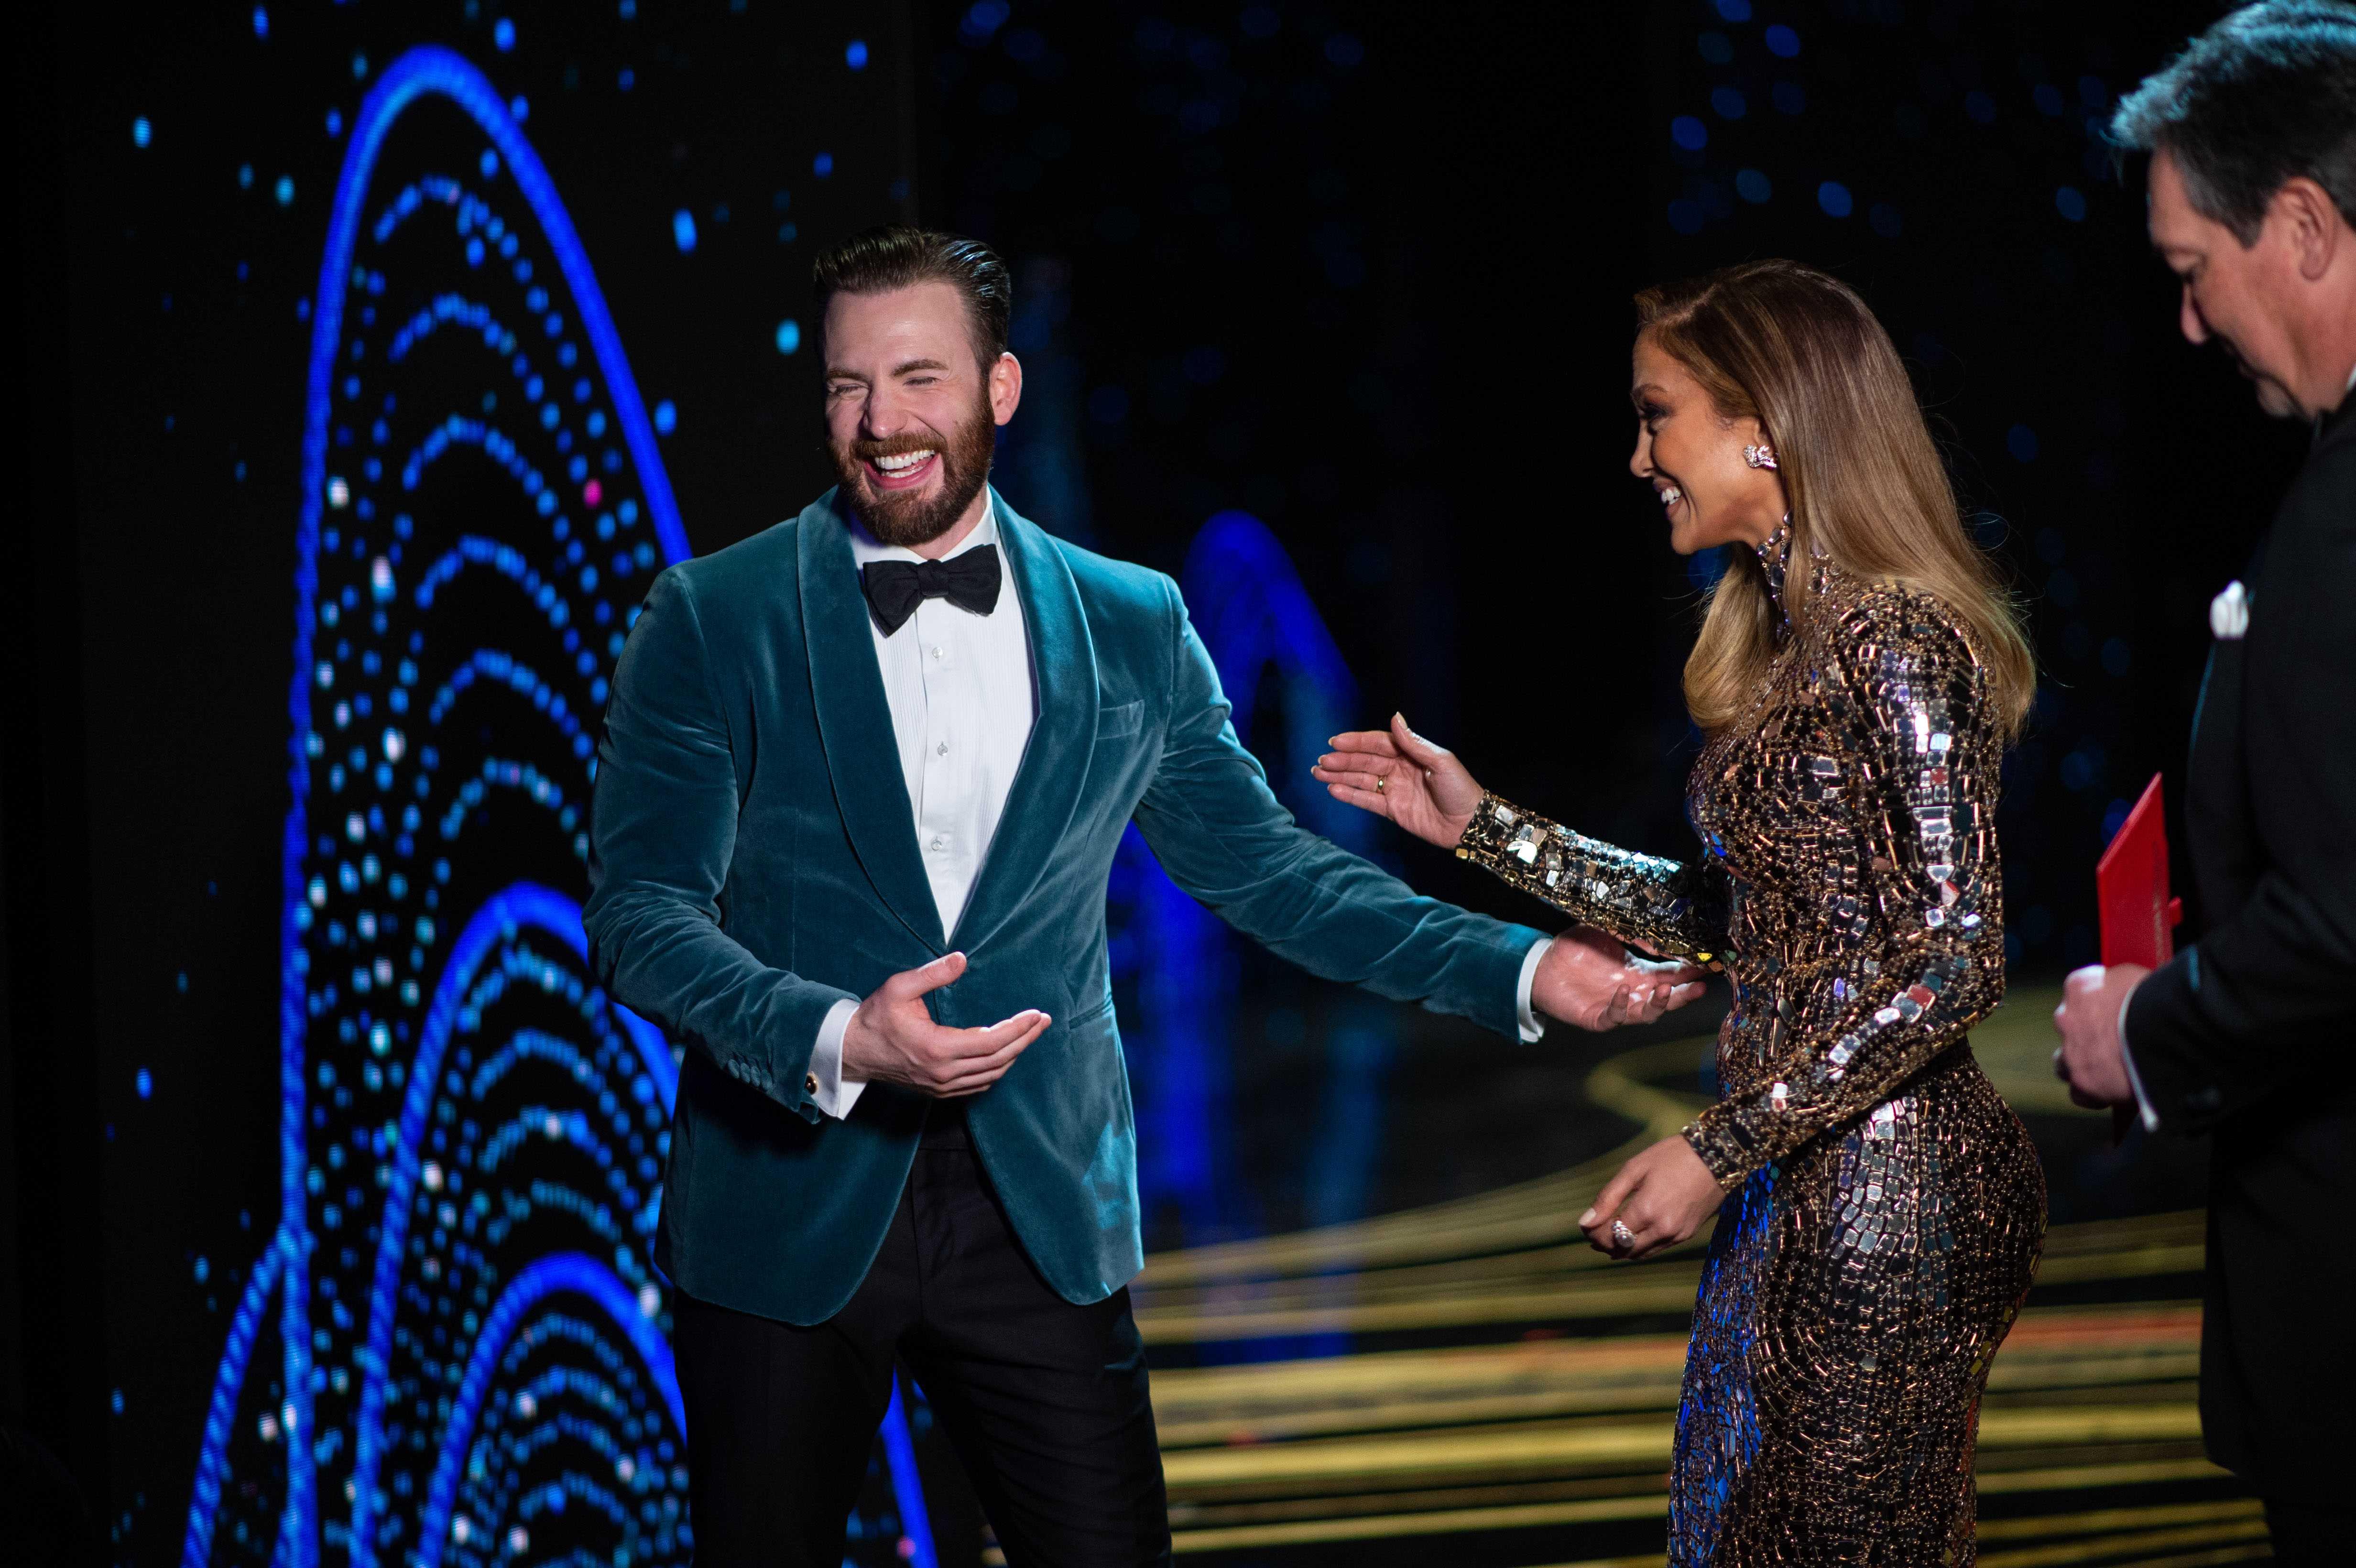 The 91st Oscars finally happened